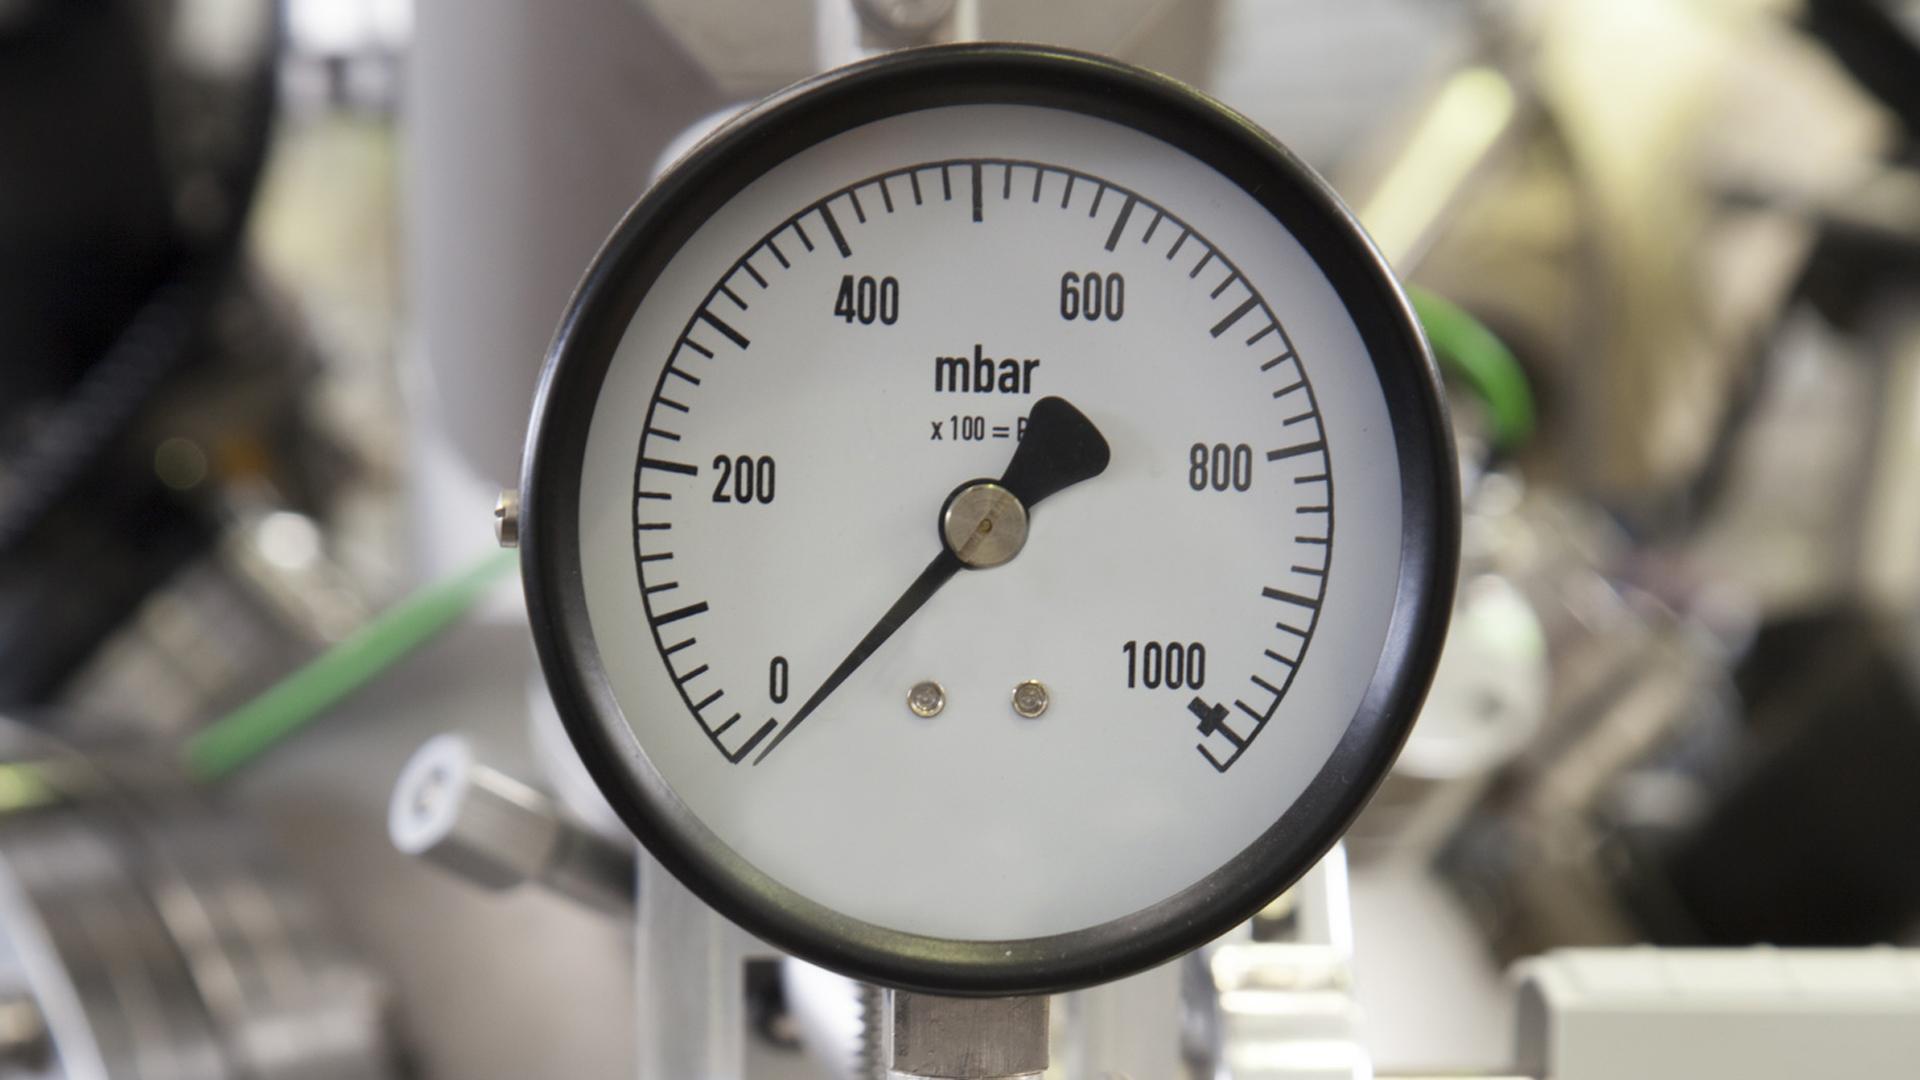 Measurement-&-Instrumentation